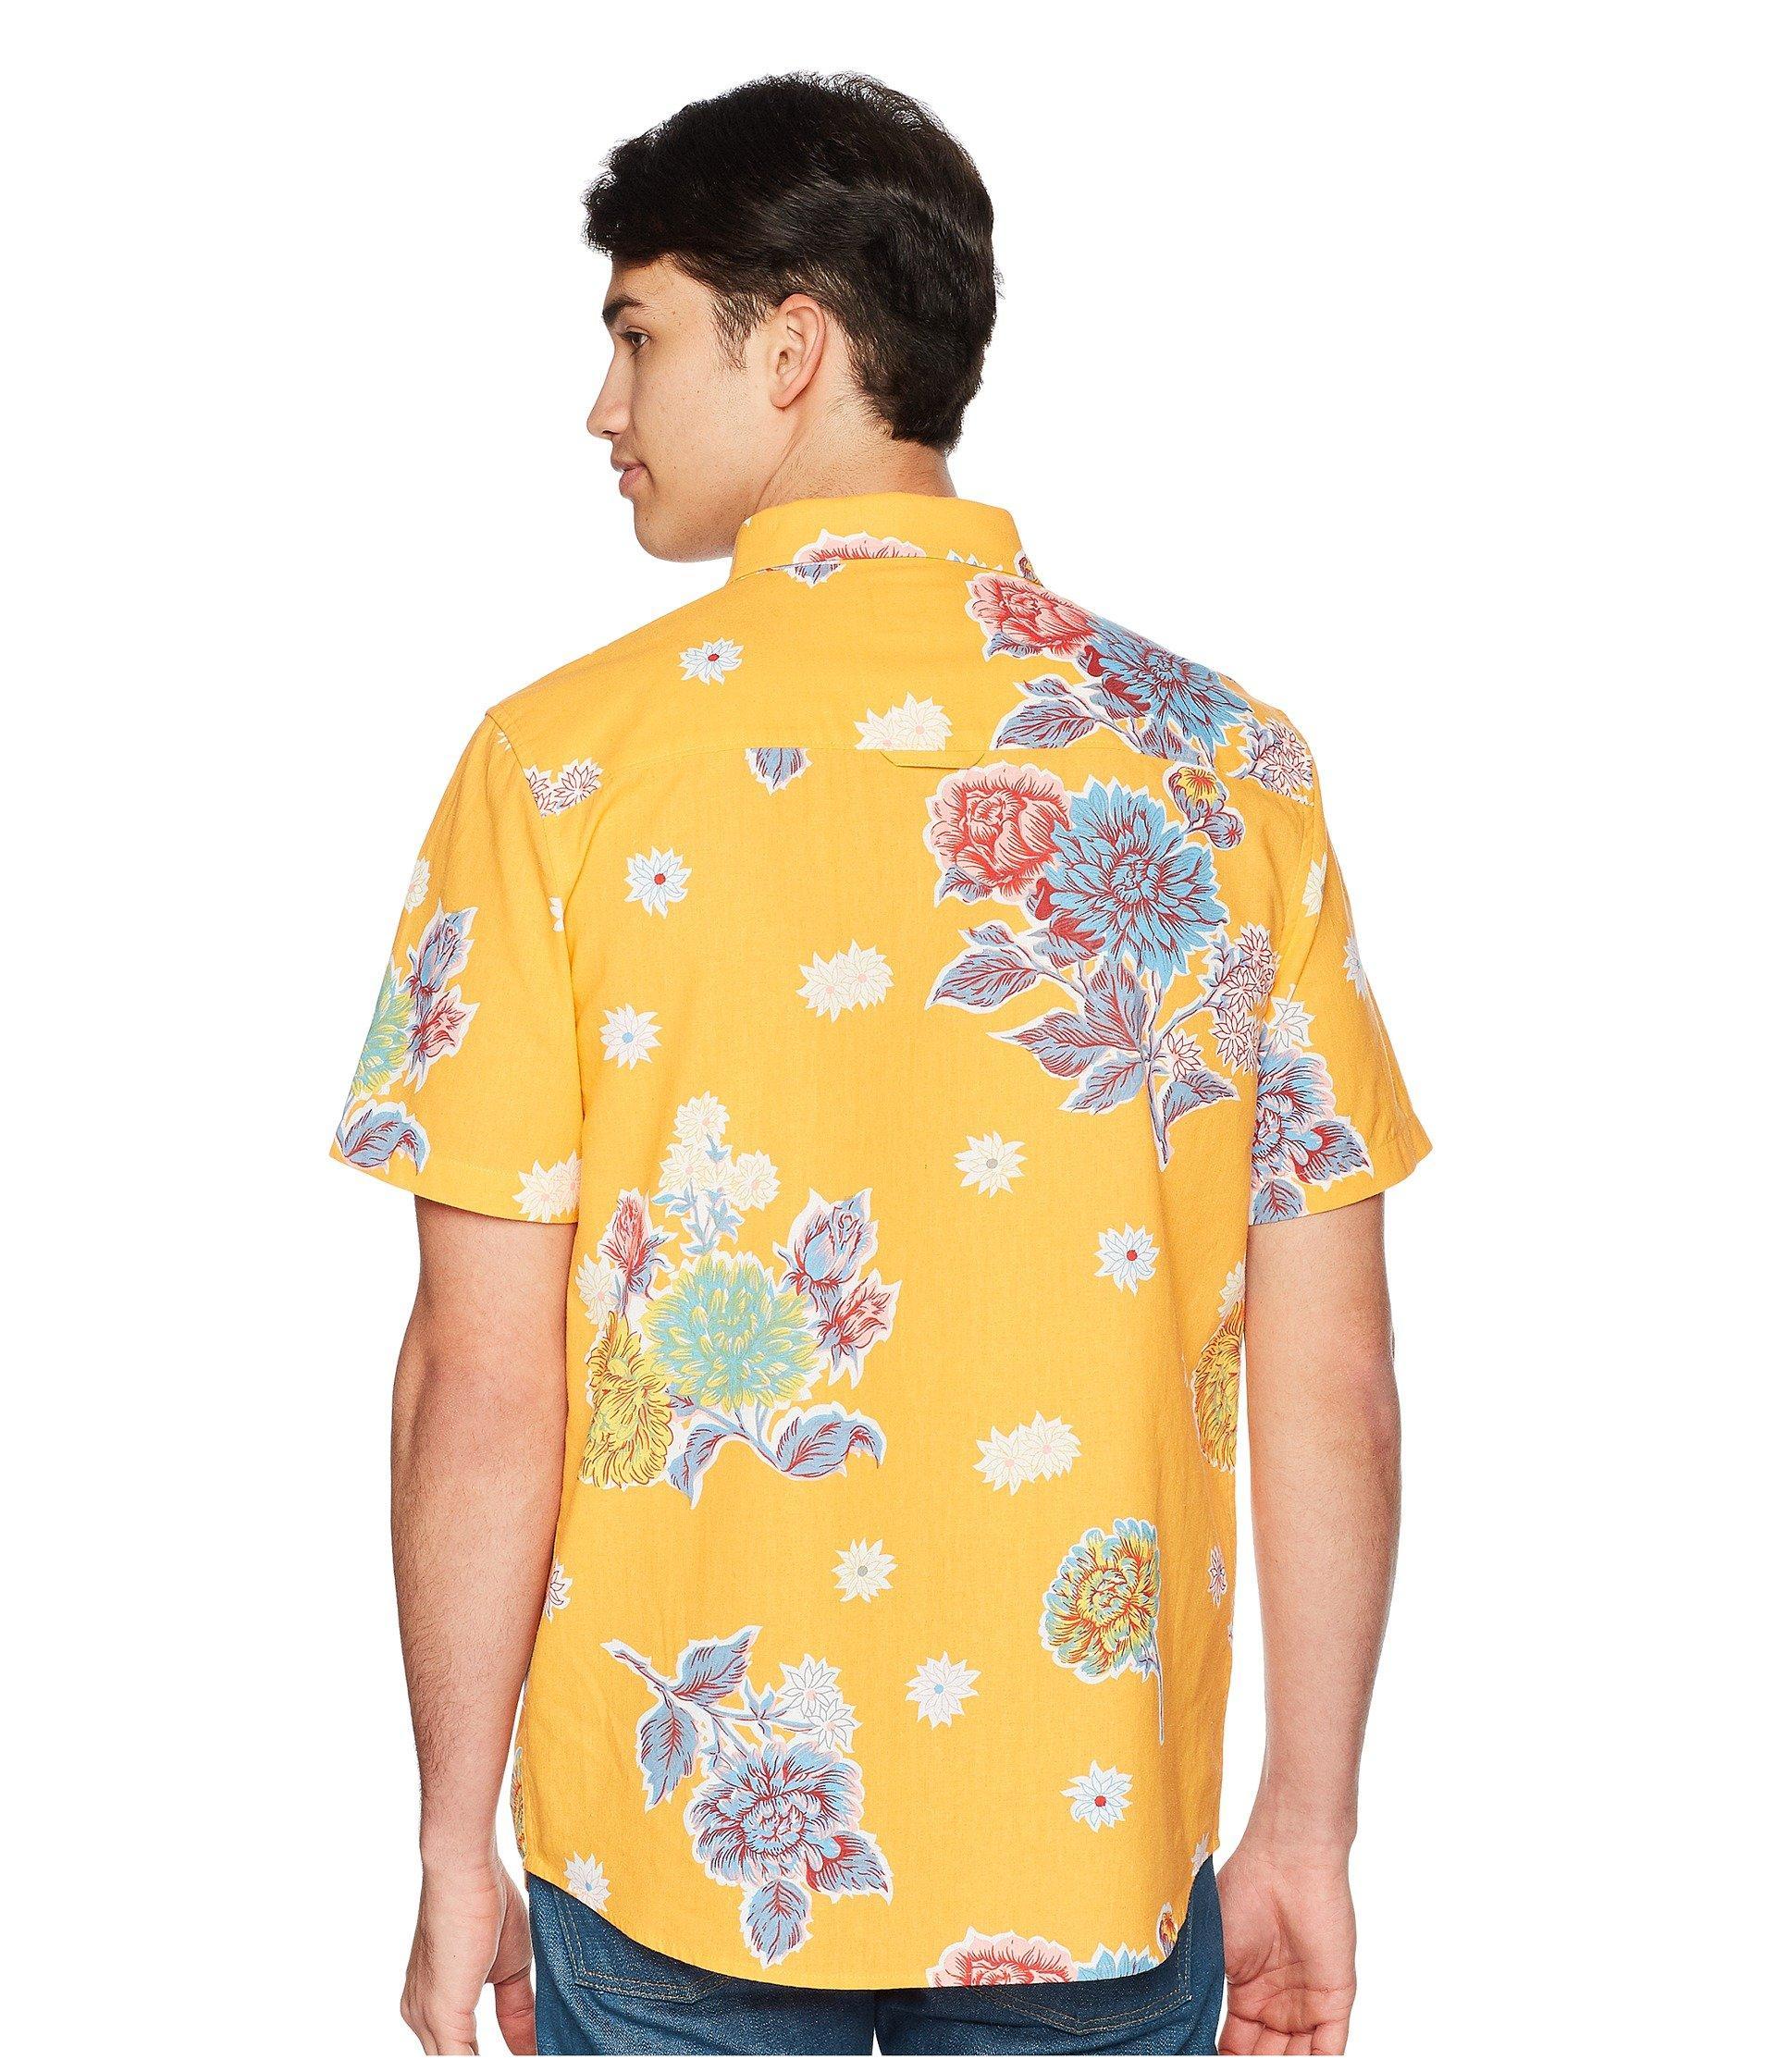 Short Shirt 33 Lyst Sleeve Save Huf Floral Botanical Men For qzVMGSUp